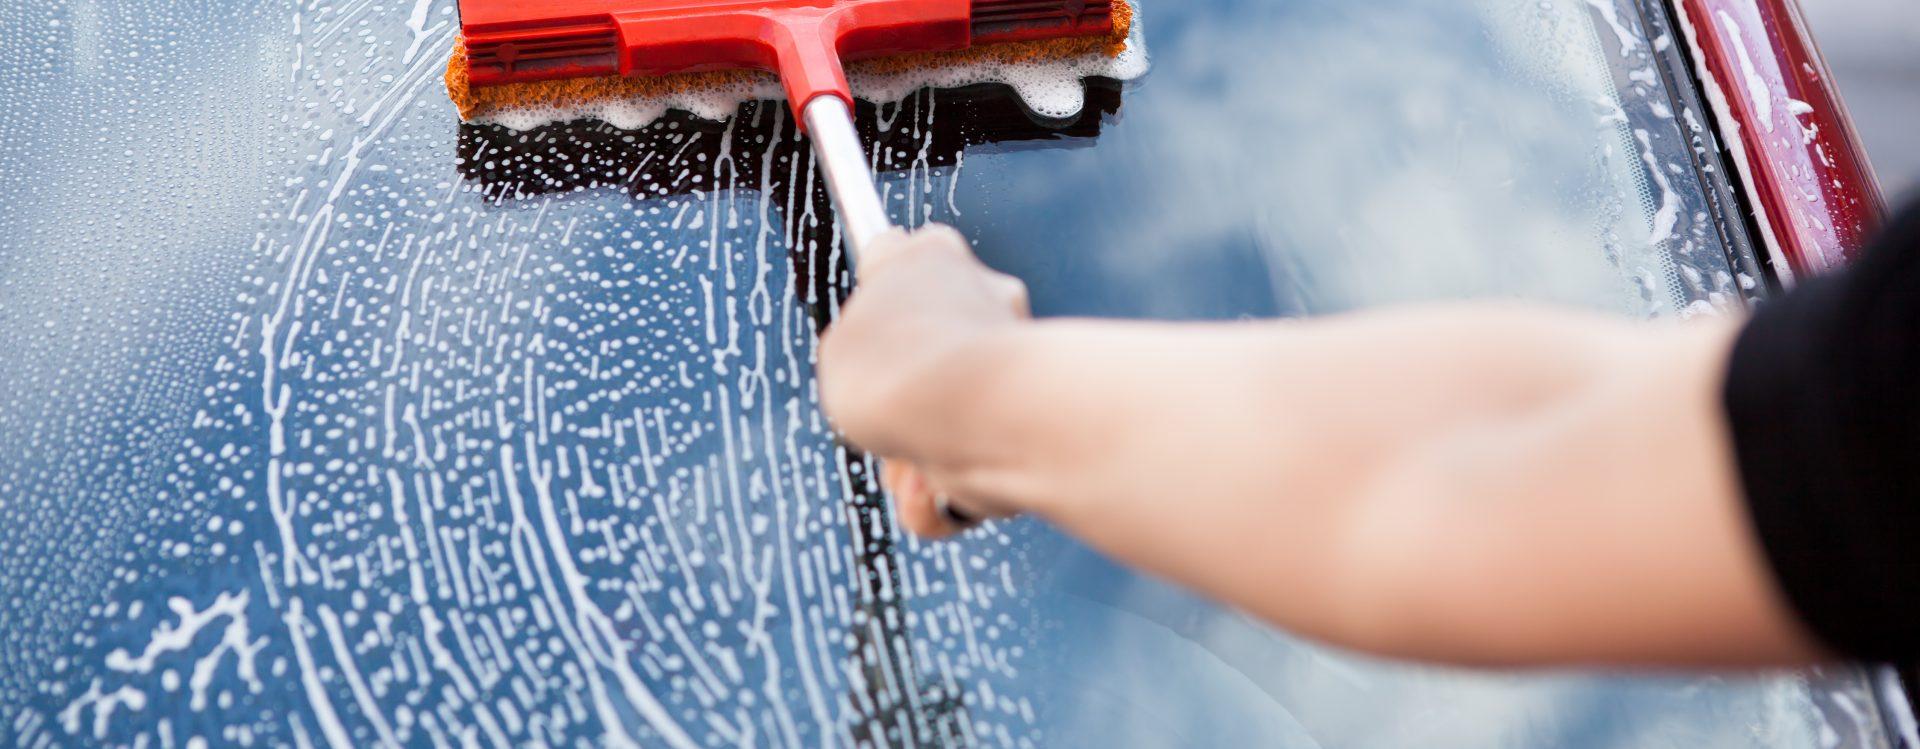 Wash 66 Car Wash Auto Detailing In Quispamsis New Brunswick